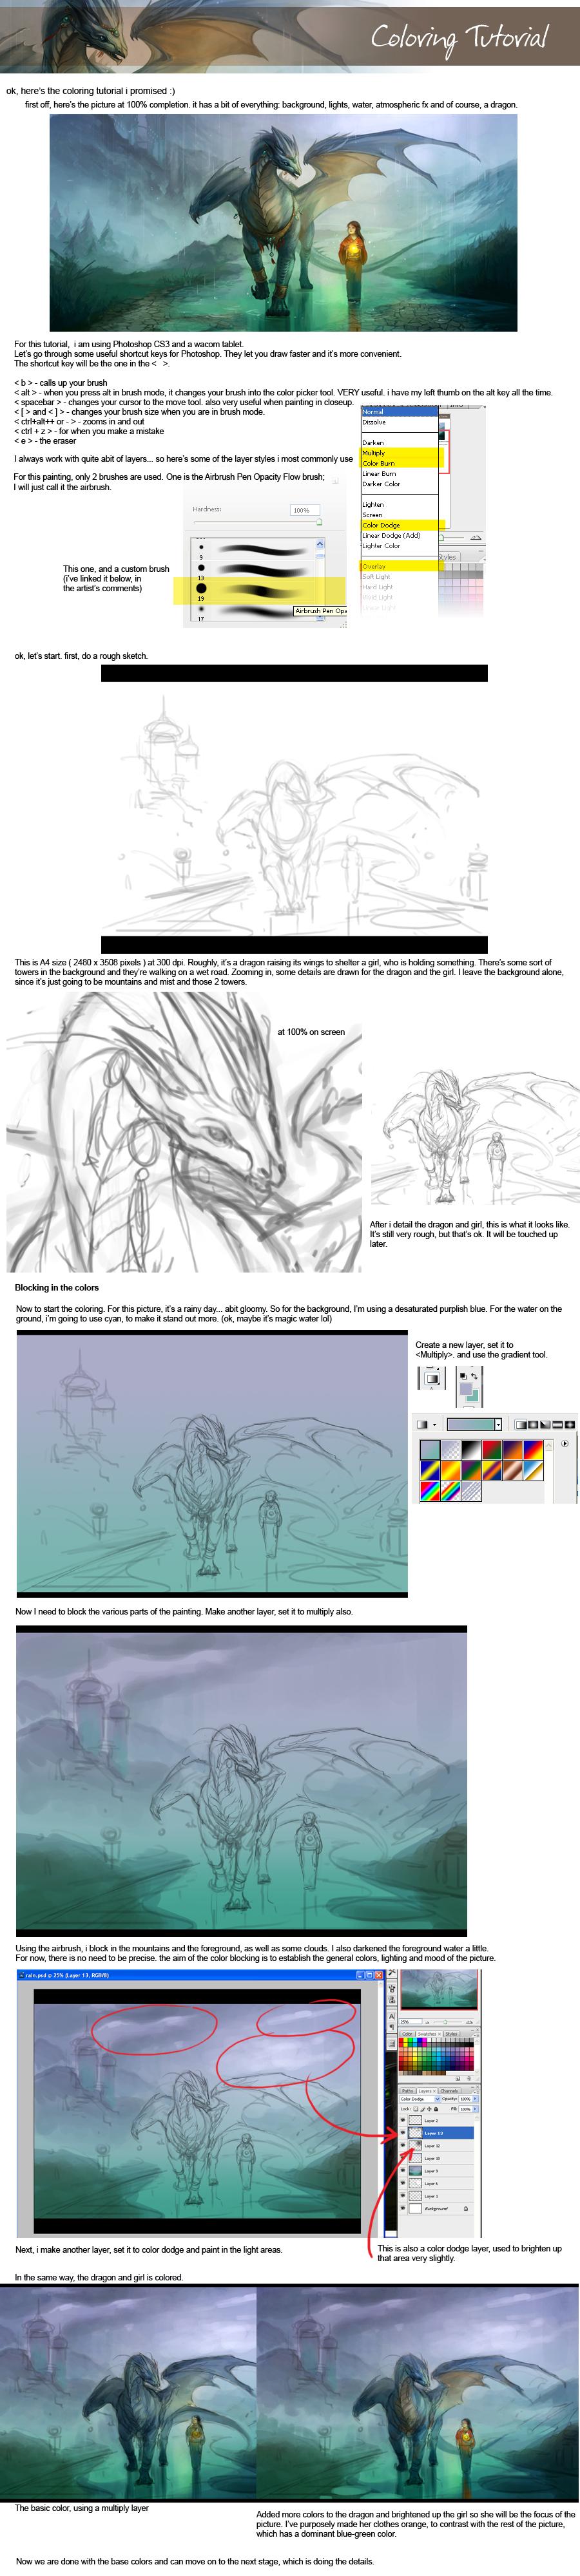 Coloring tutorial - 01 by sandara